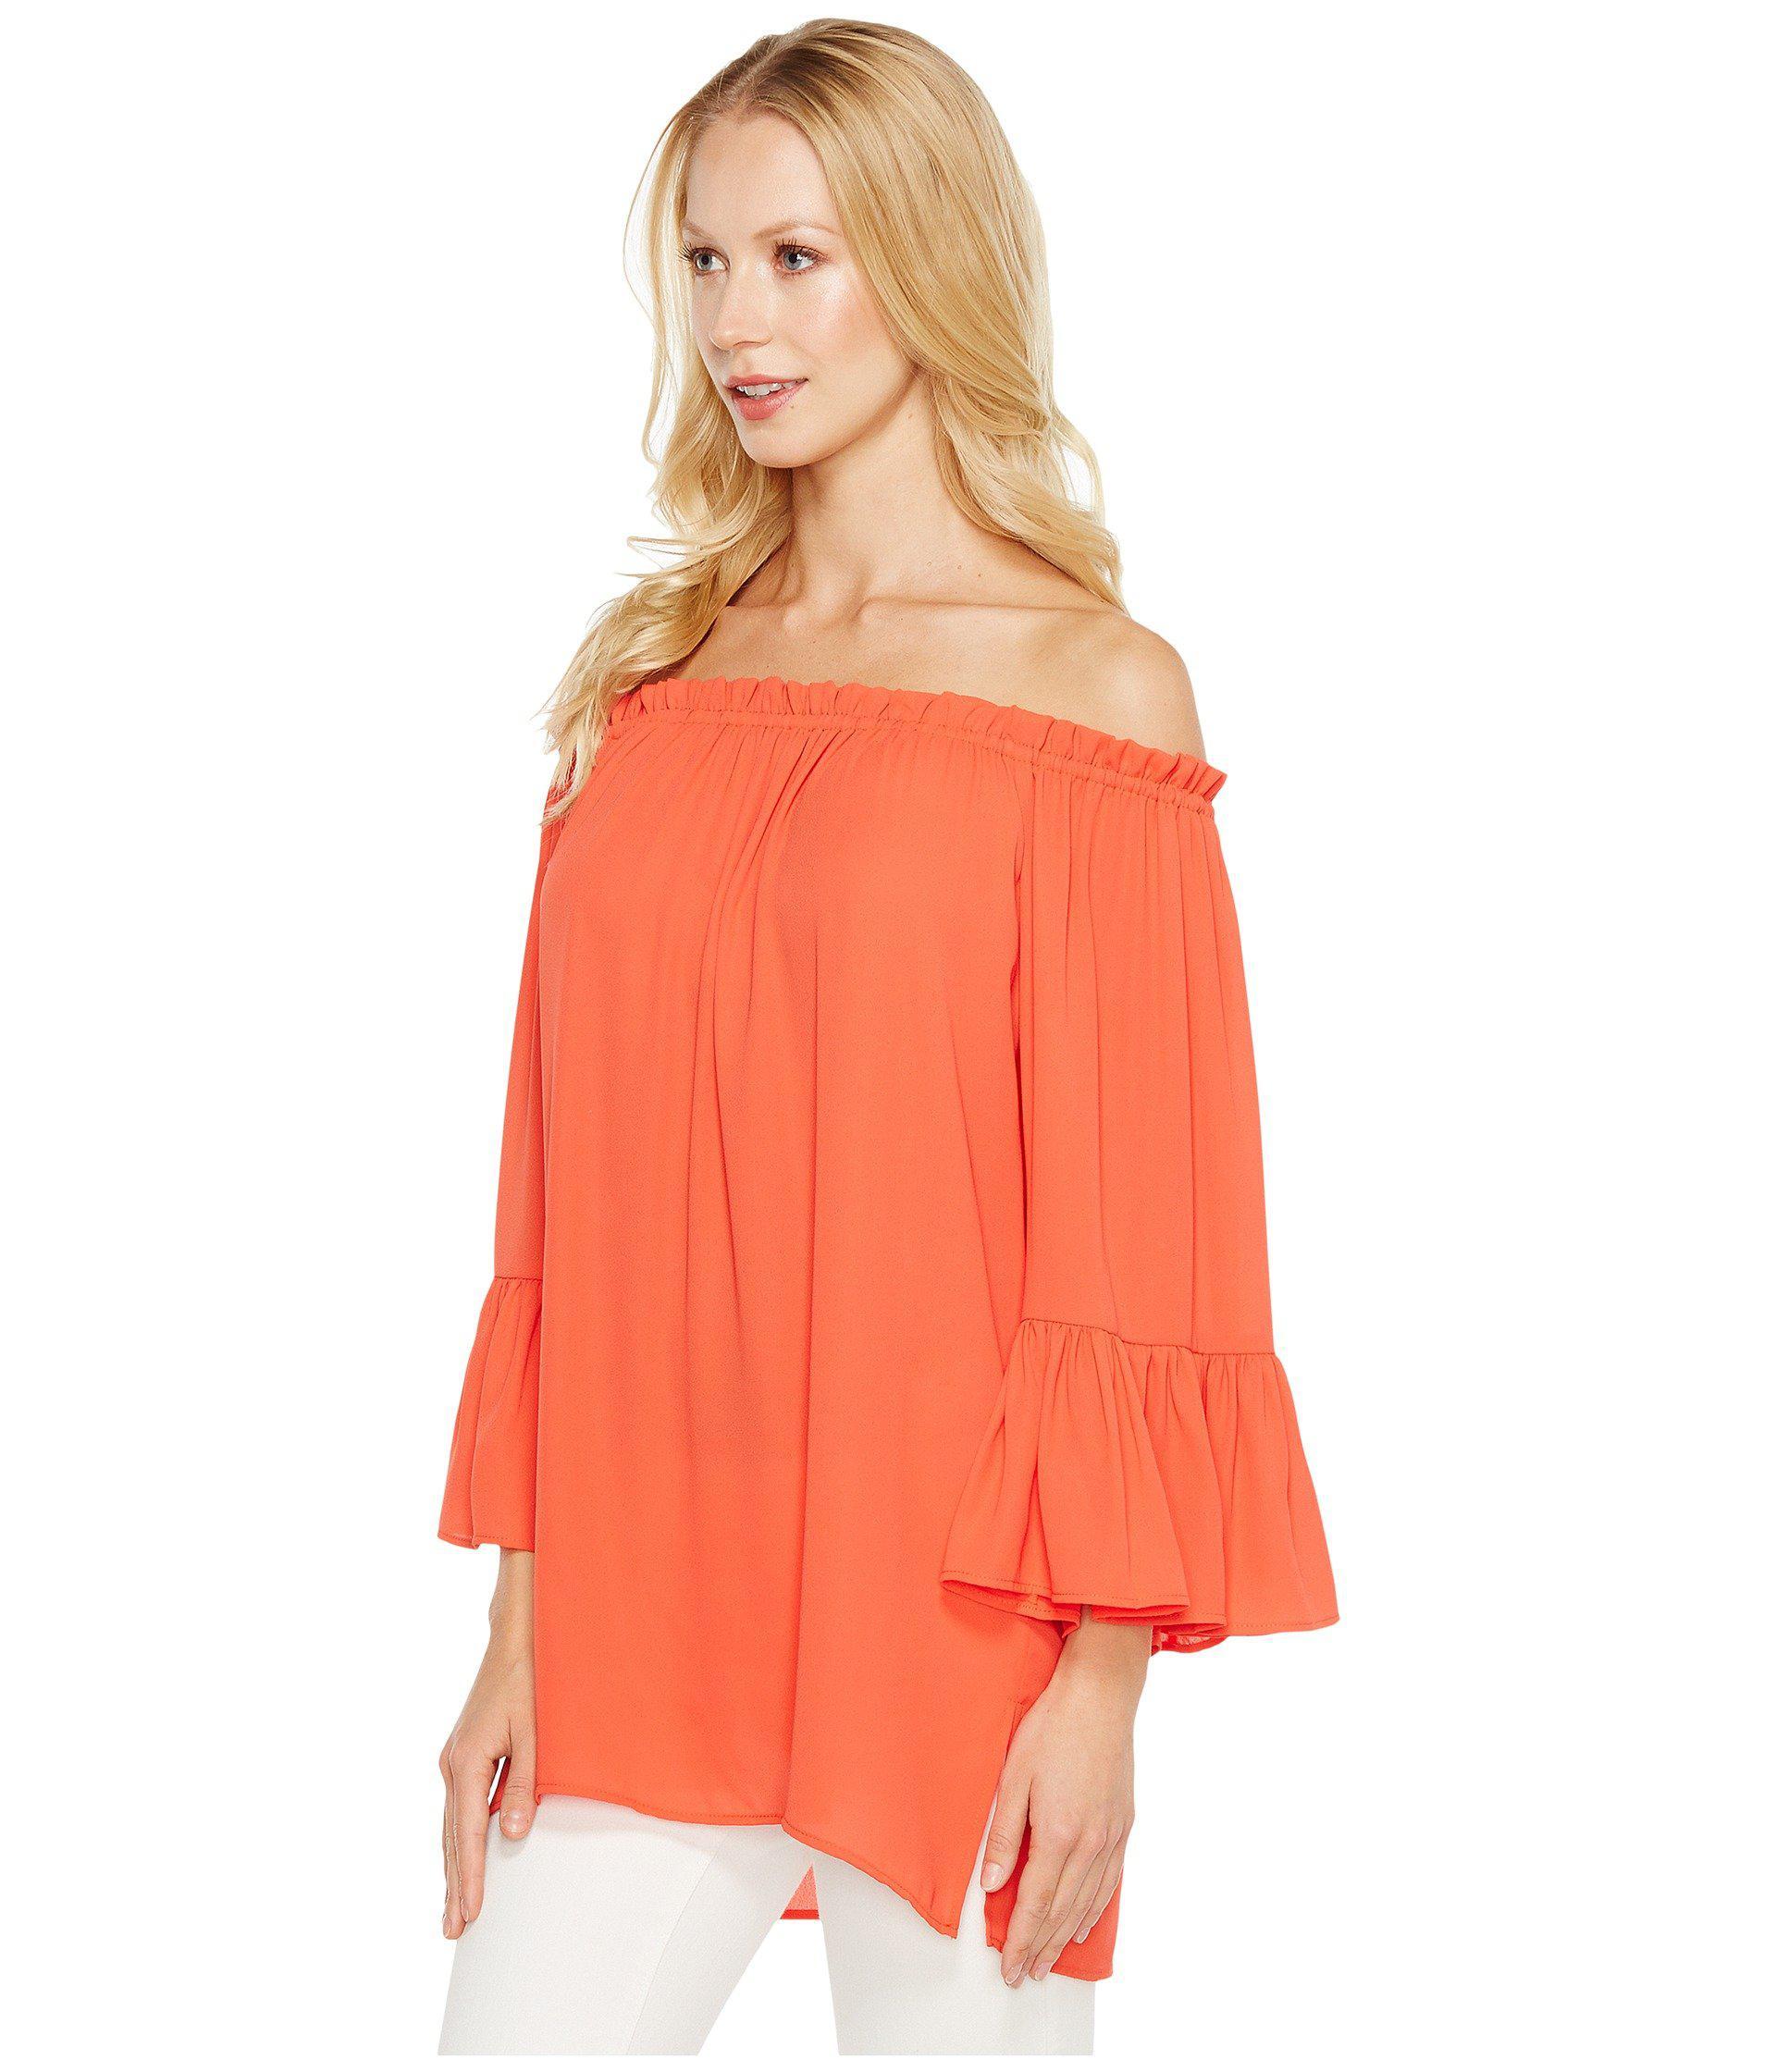 160b424d665b Lyst - Karen Kane Convertible Off The Shoulder Top in Orange - Save 44%